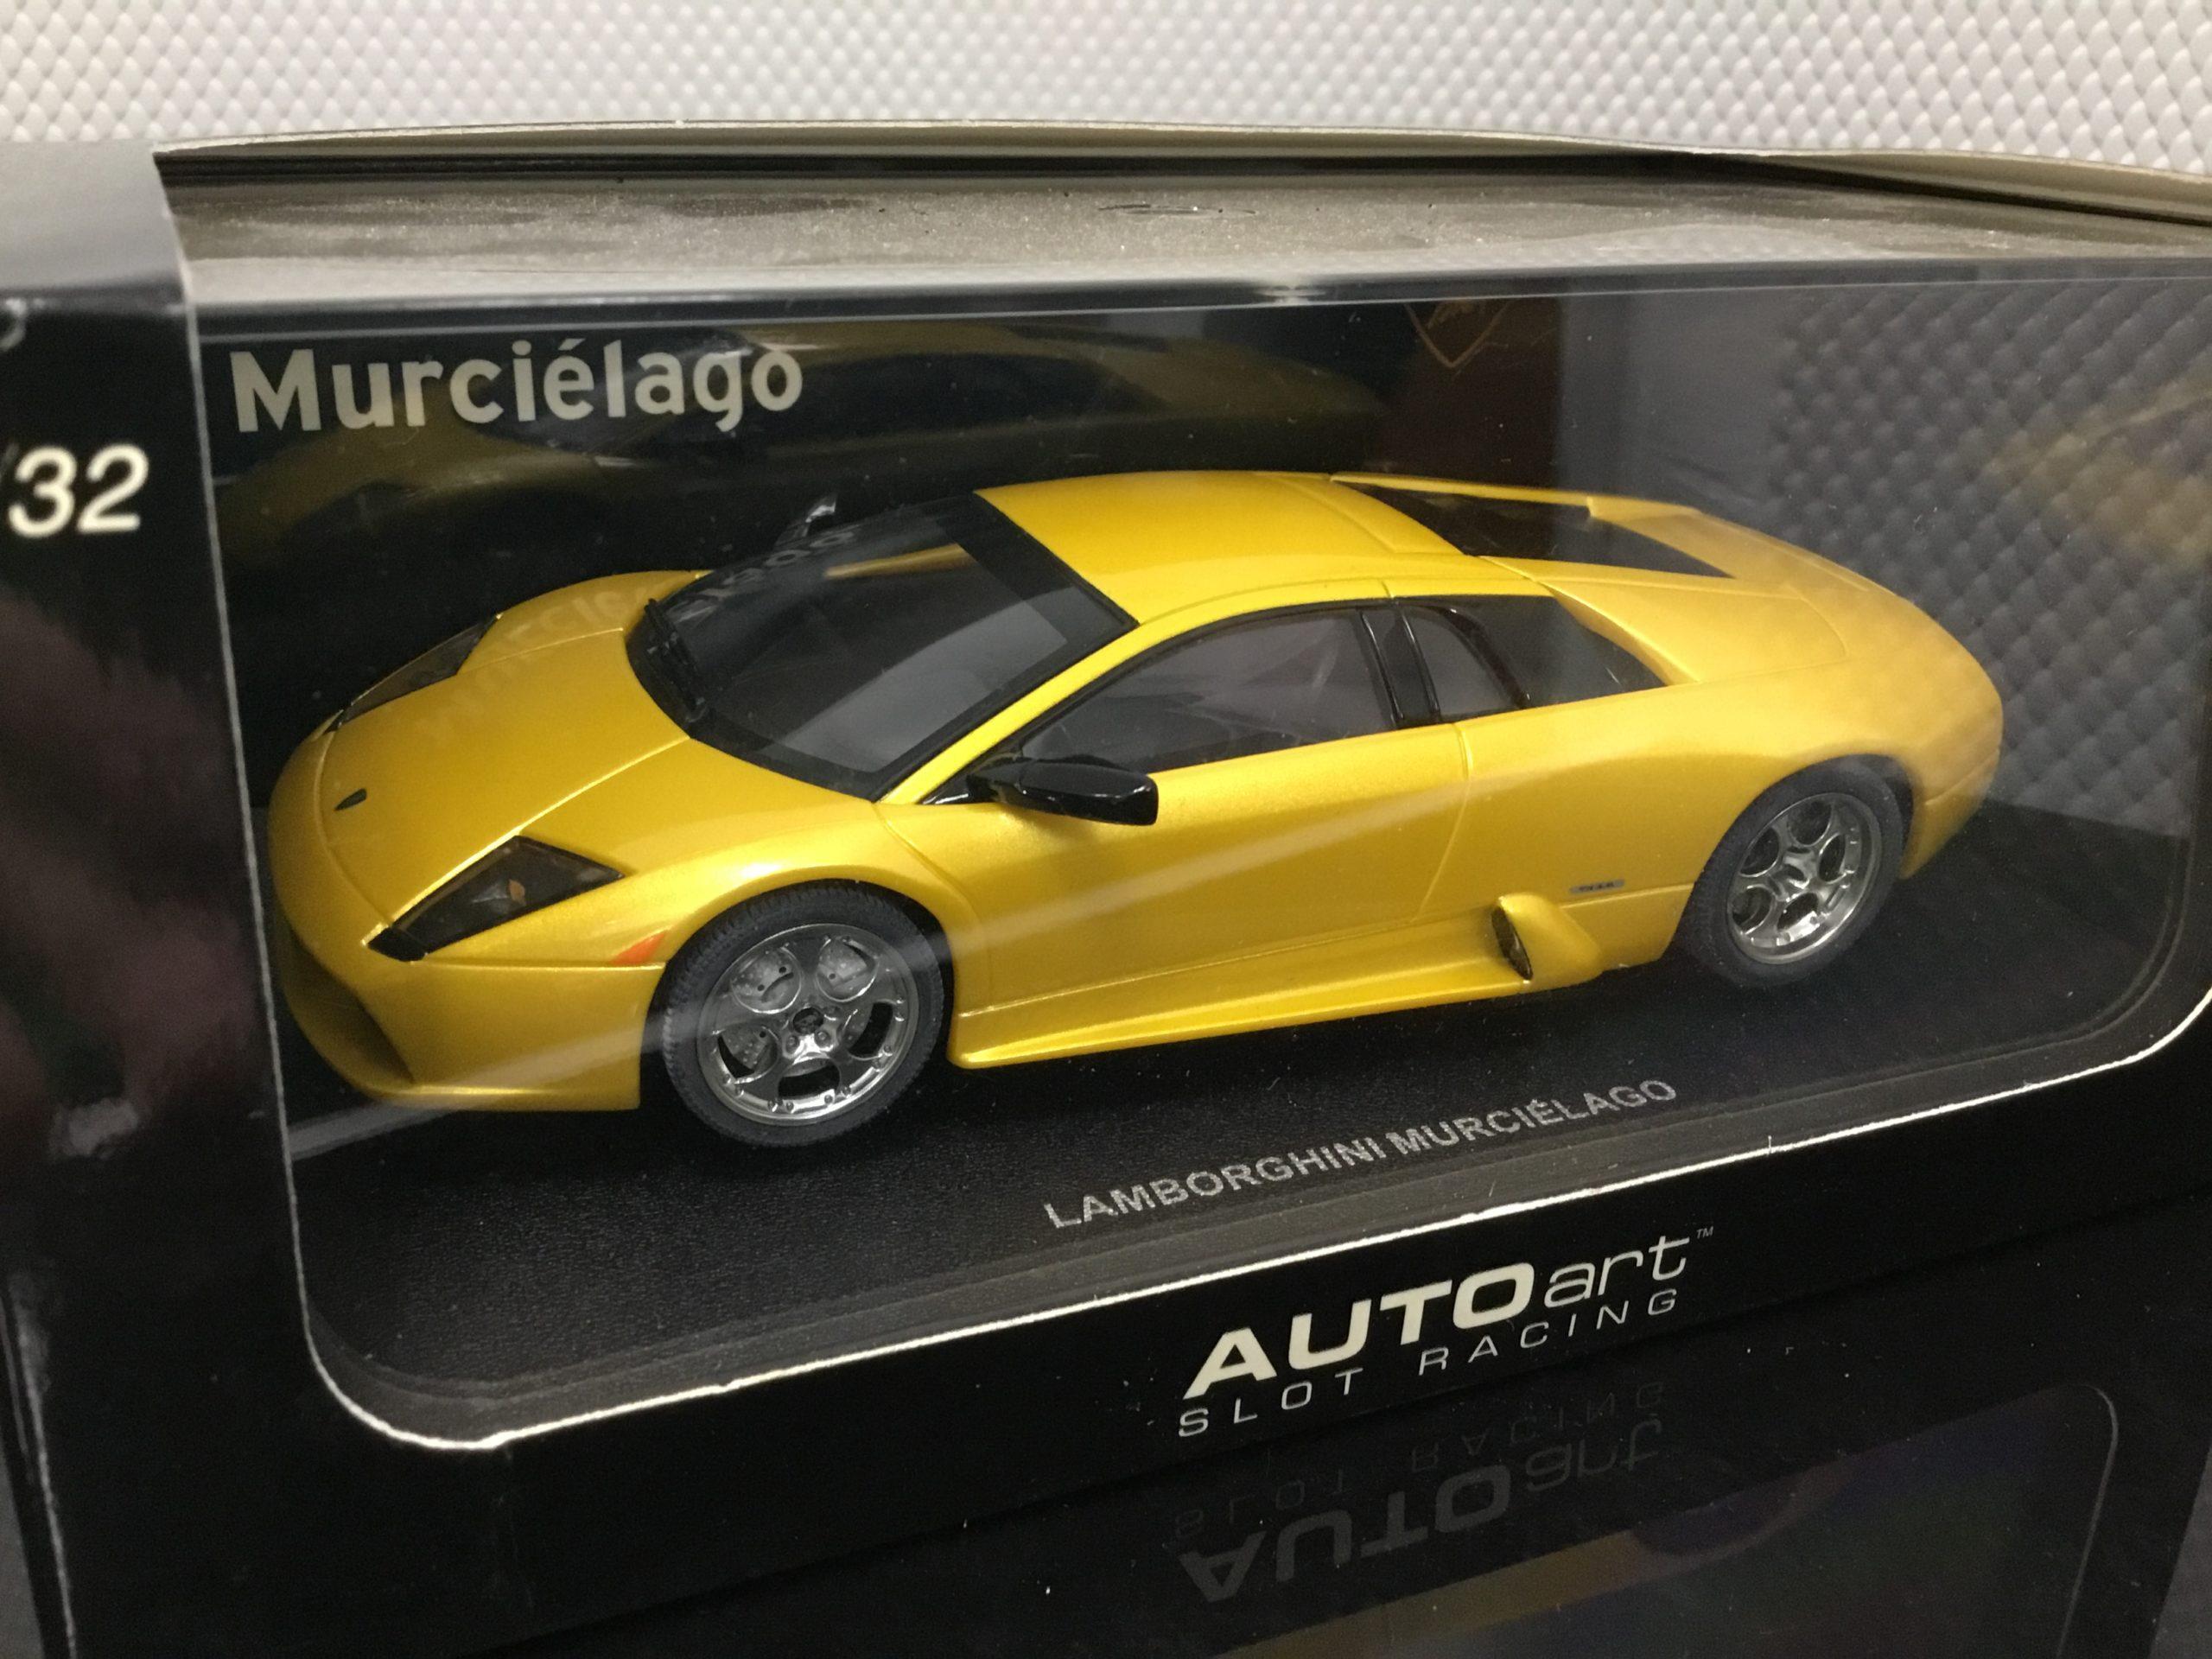 AutoArt 13021 Lamborghini Murcielago 1/32 Slot Car.